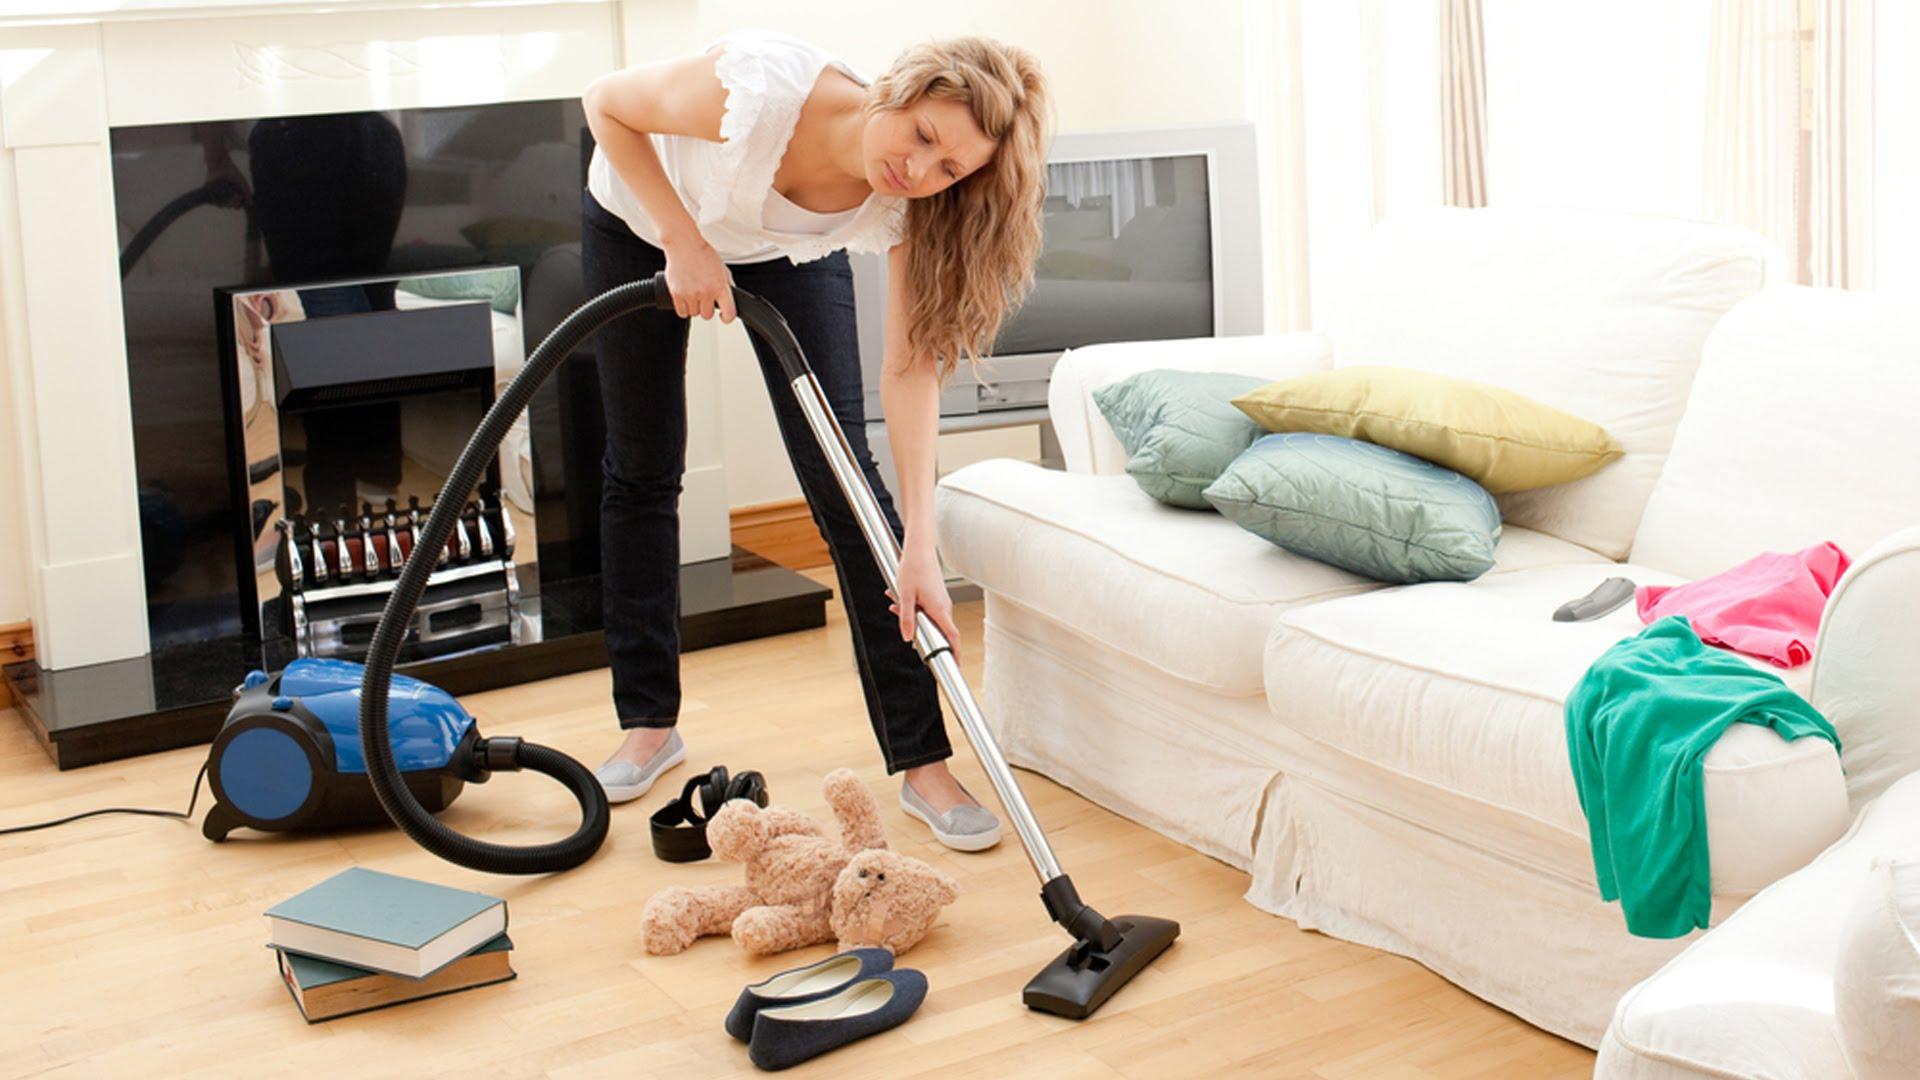 Девушка наводит порядок в доме